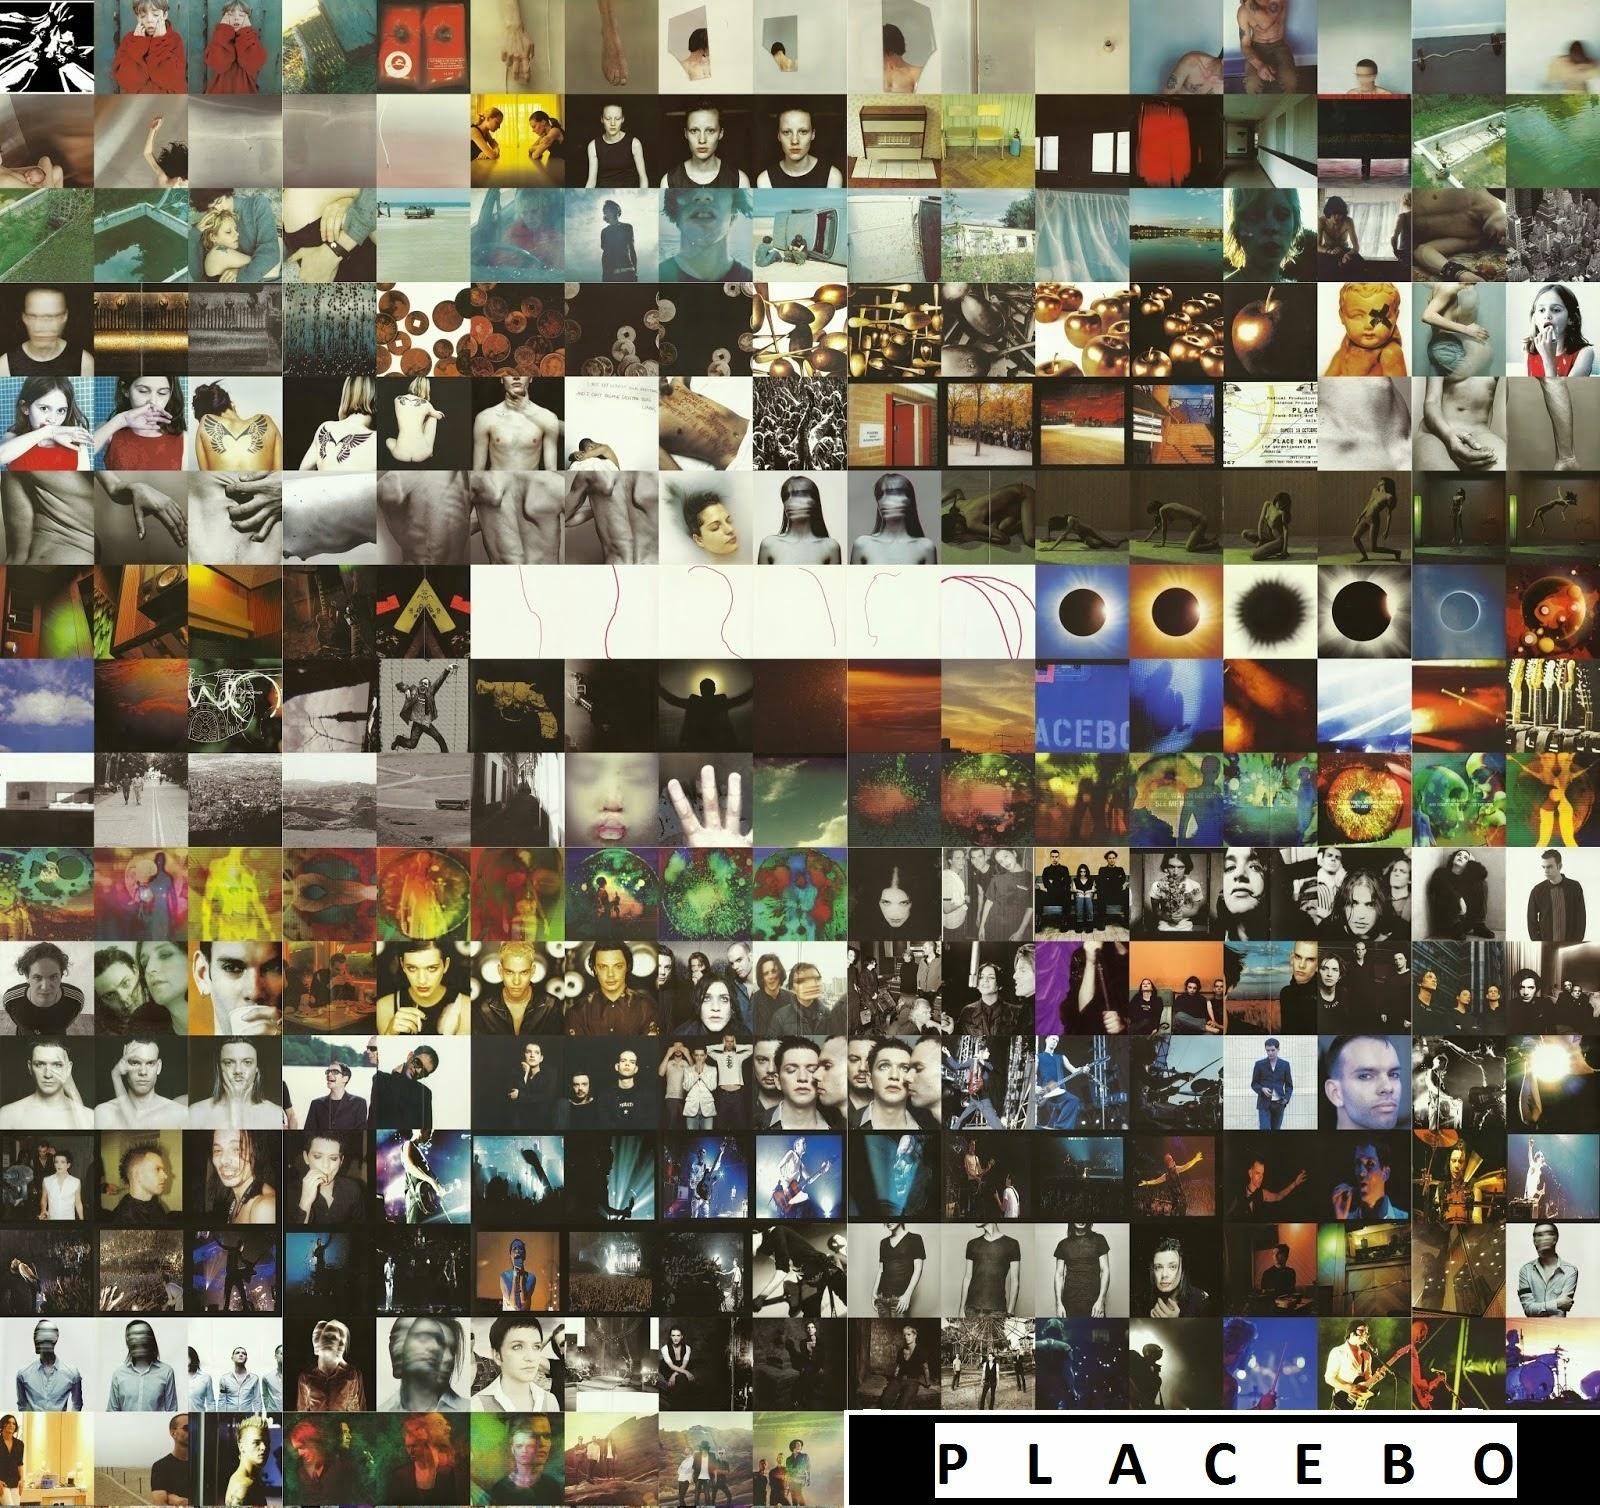 Placebo торрент дискография.